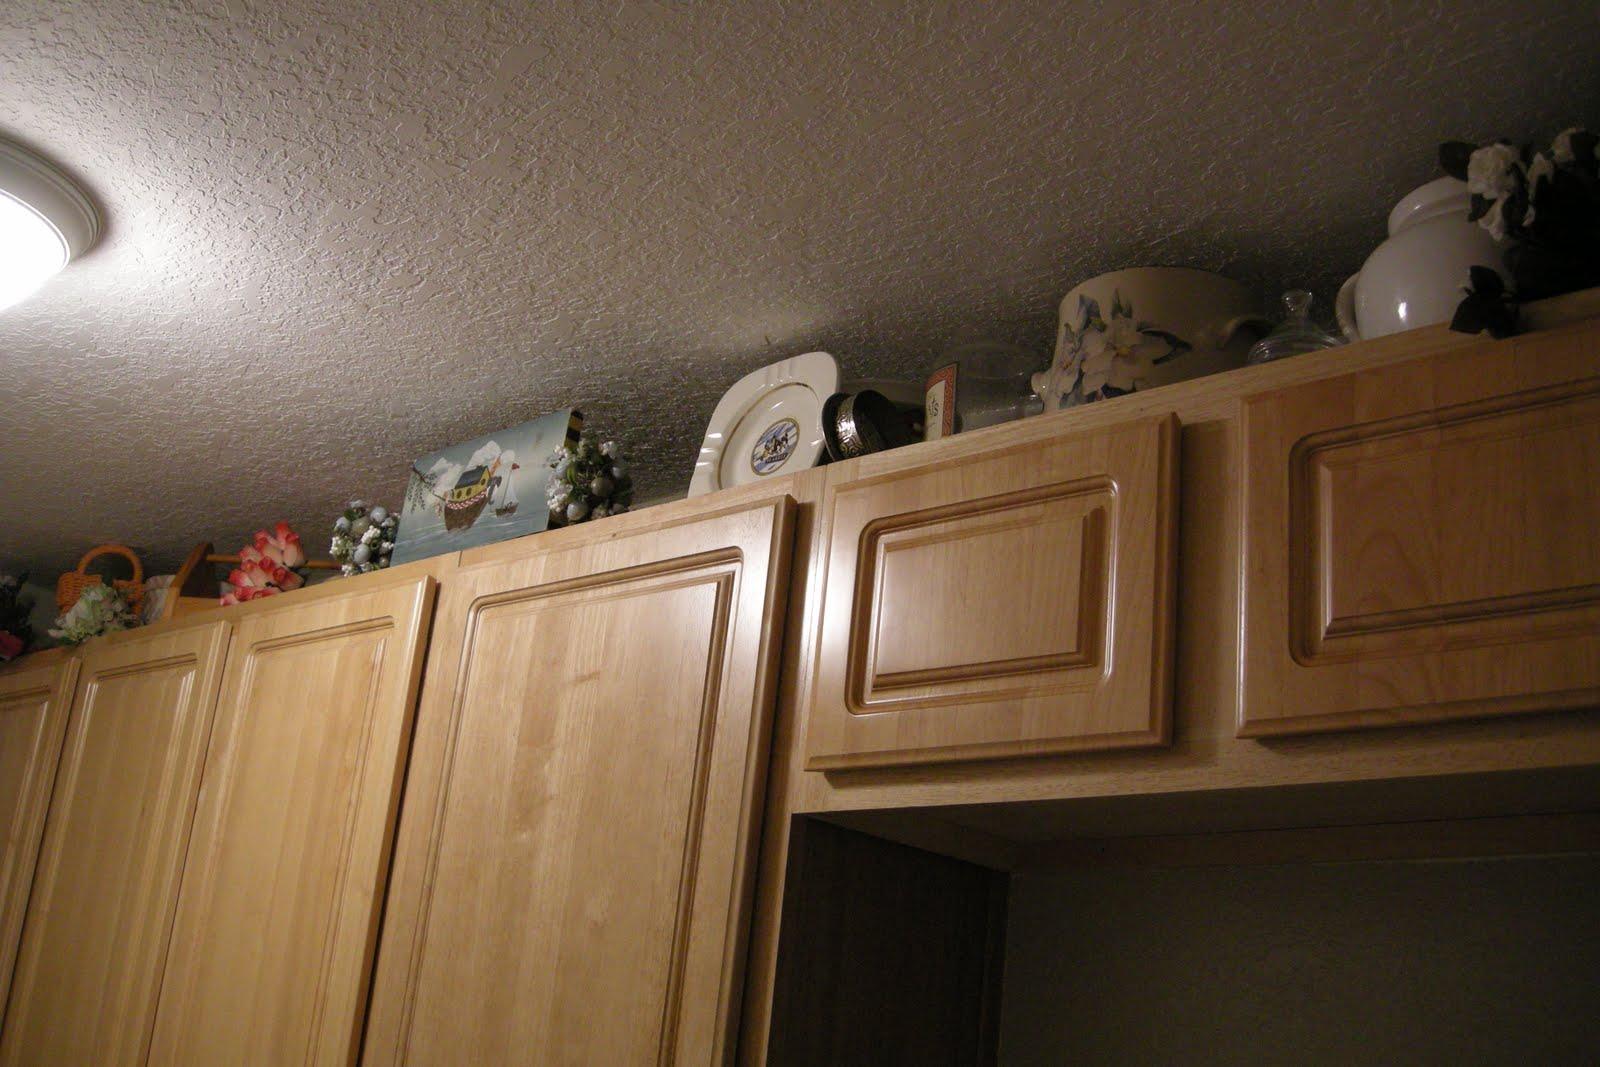 http://3.bp.blogspot.com/_ZWHi2fYLaV4/TH73n_wnb6I/AAAAAAAABUQ/9Ps8yq56Qa0/s1600/Wallpaper+up+in+laundry+room+(5).JPG